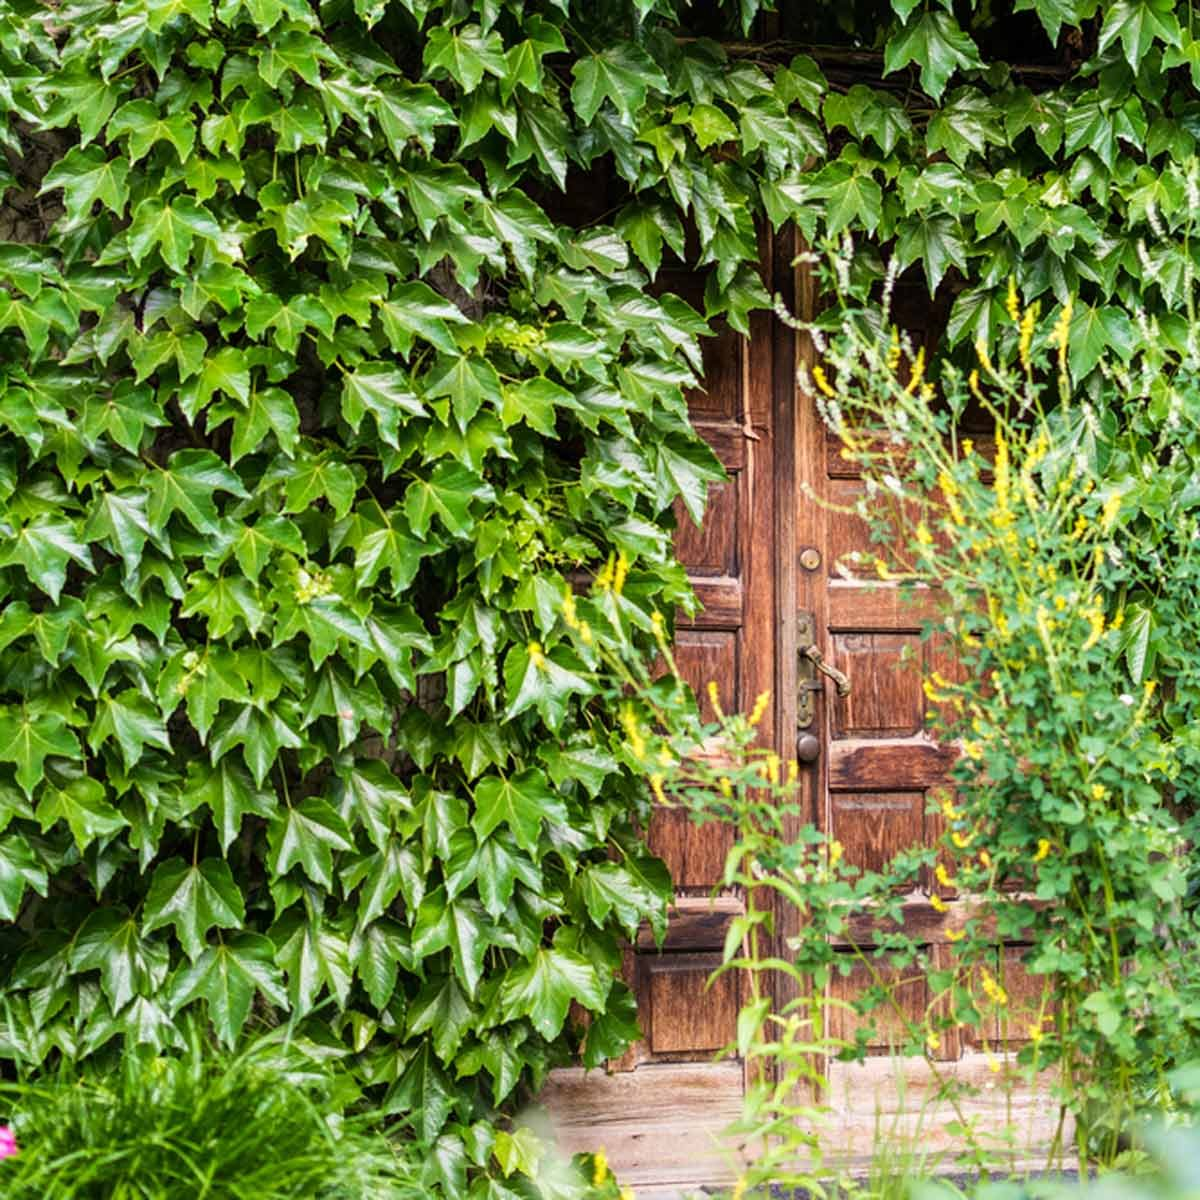 Hidden by a Natural Doorway